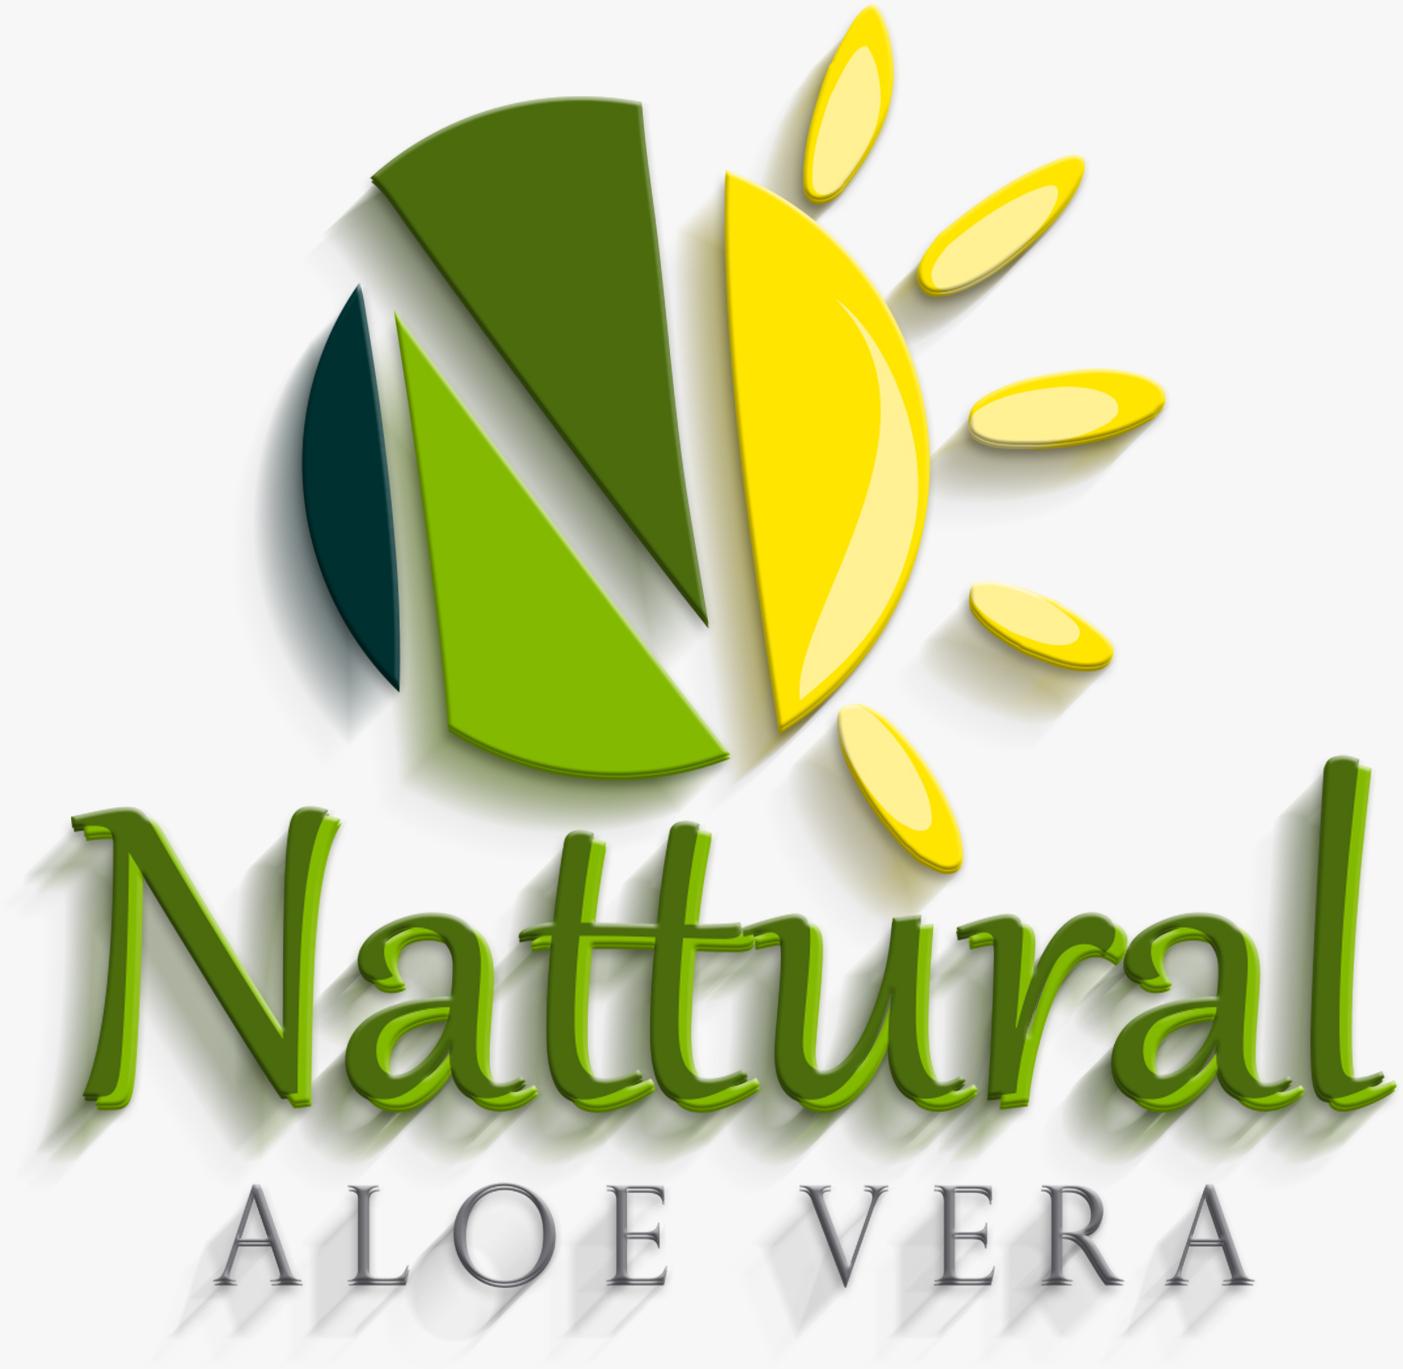 Nattural Aloe